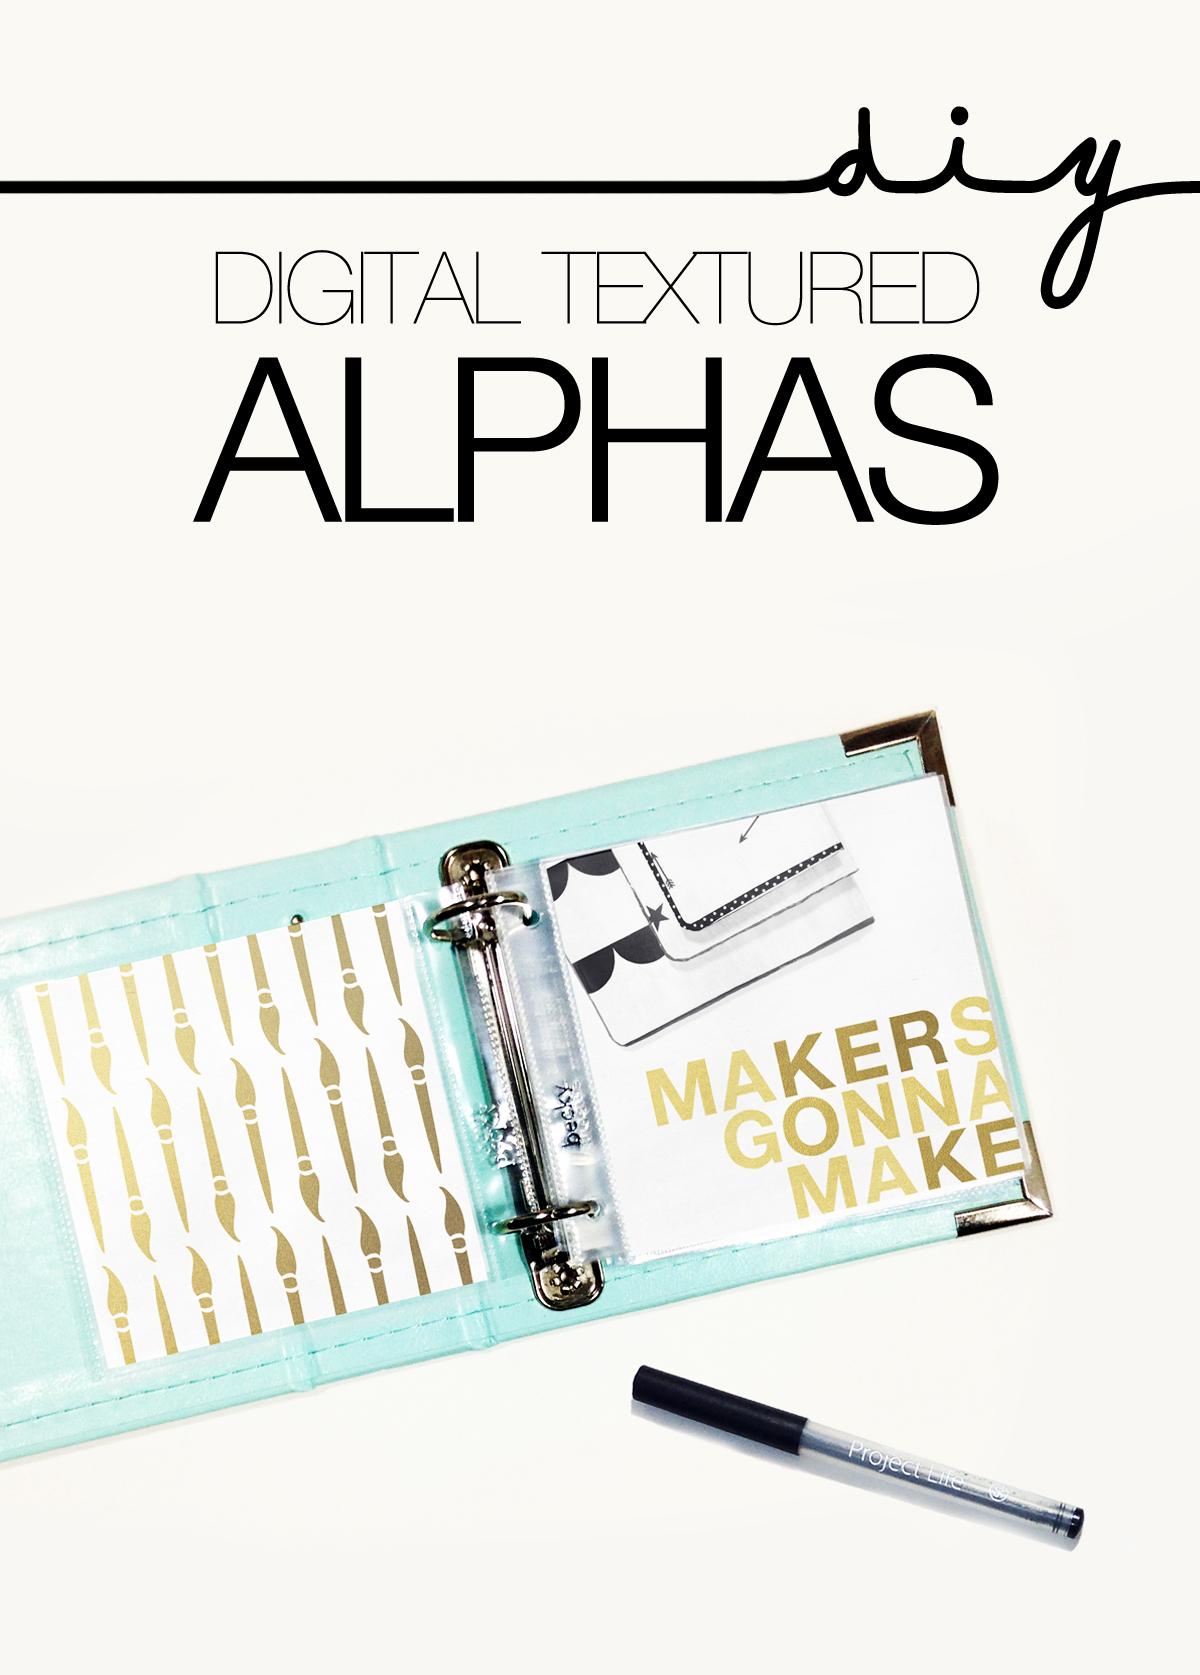 DIY DIGITAL TEXTURED ALPHAS   THE PAPER CURATOR